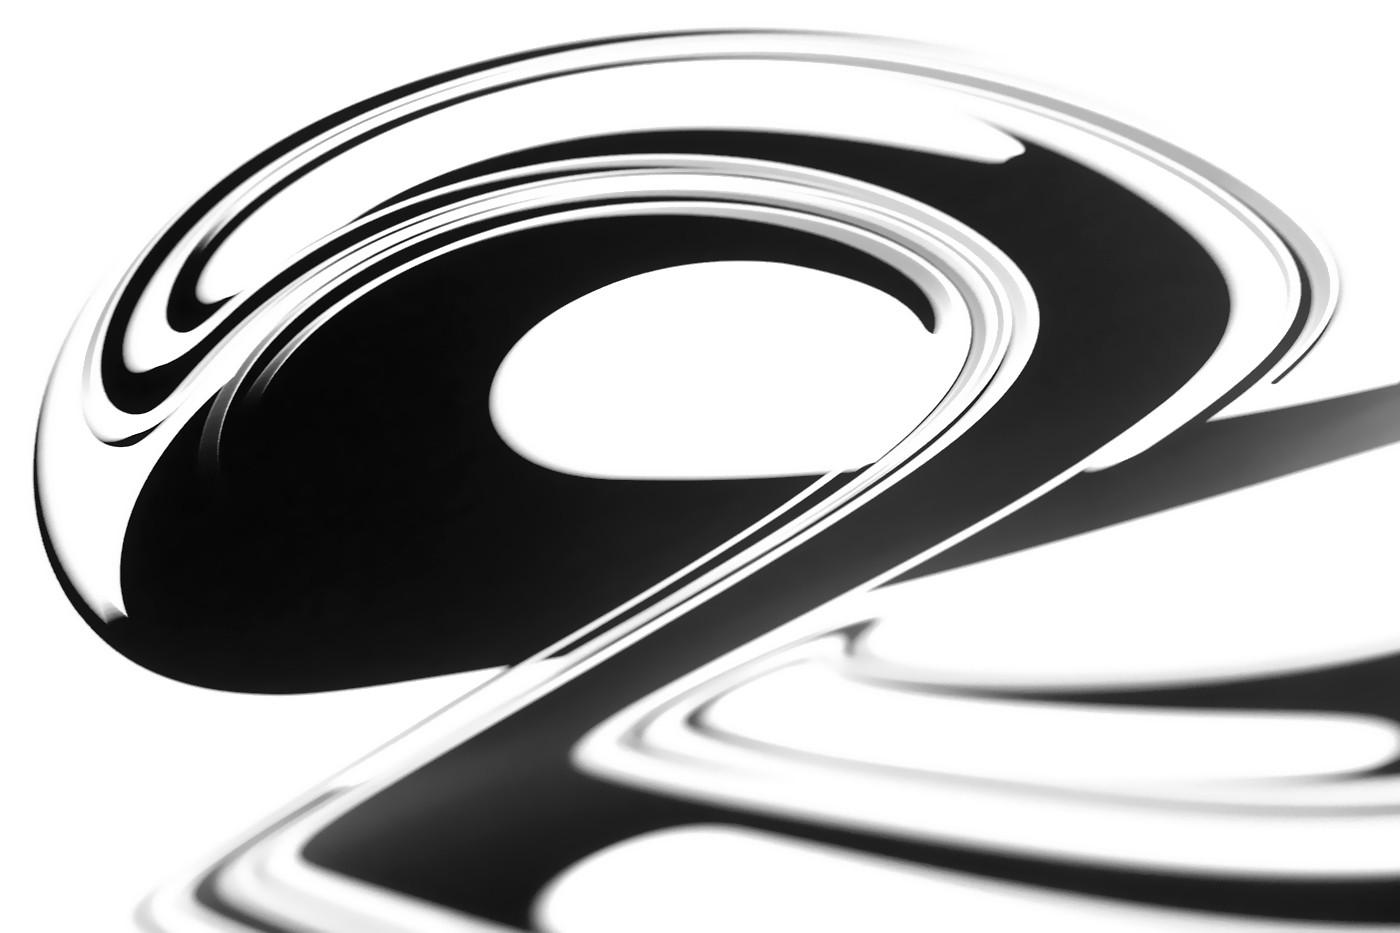 Anthony James 抽象字体设计欣赏